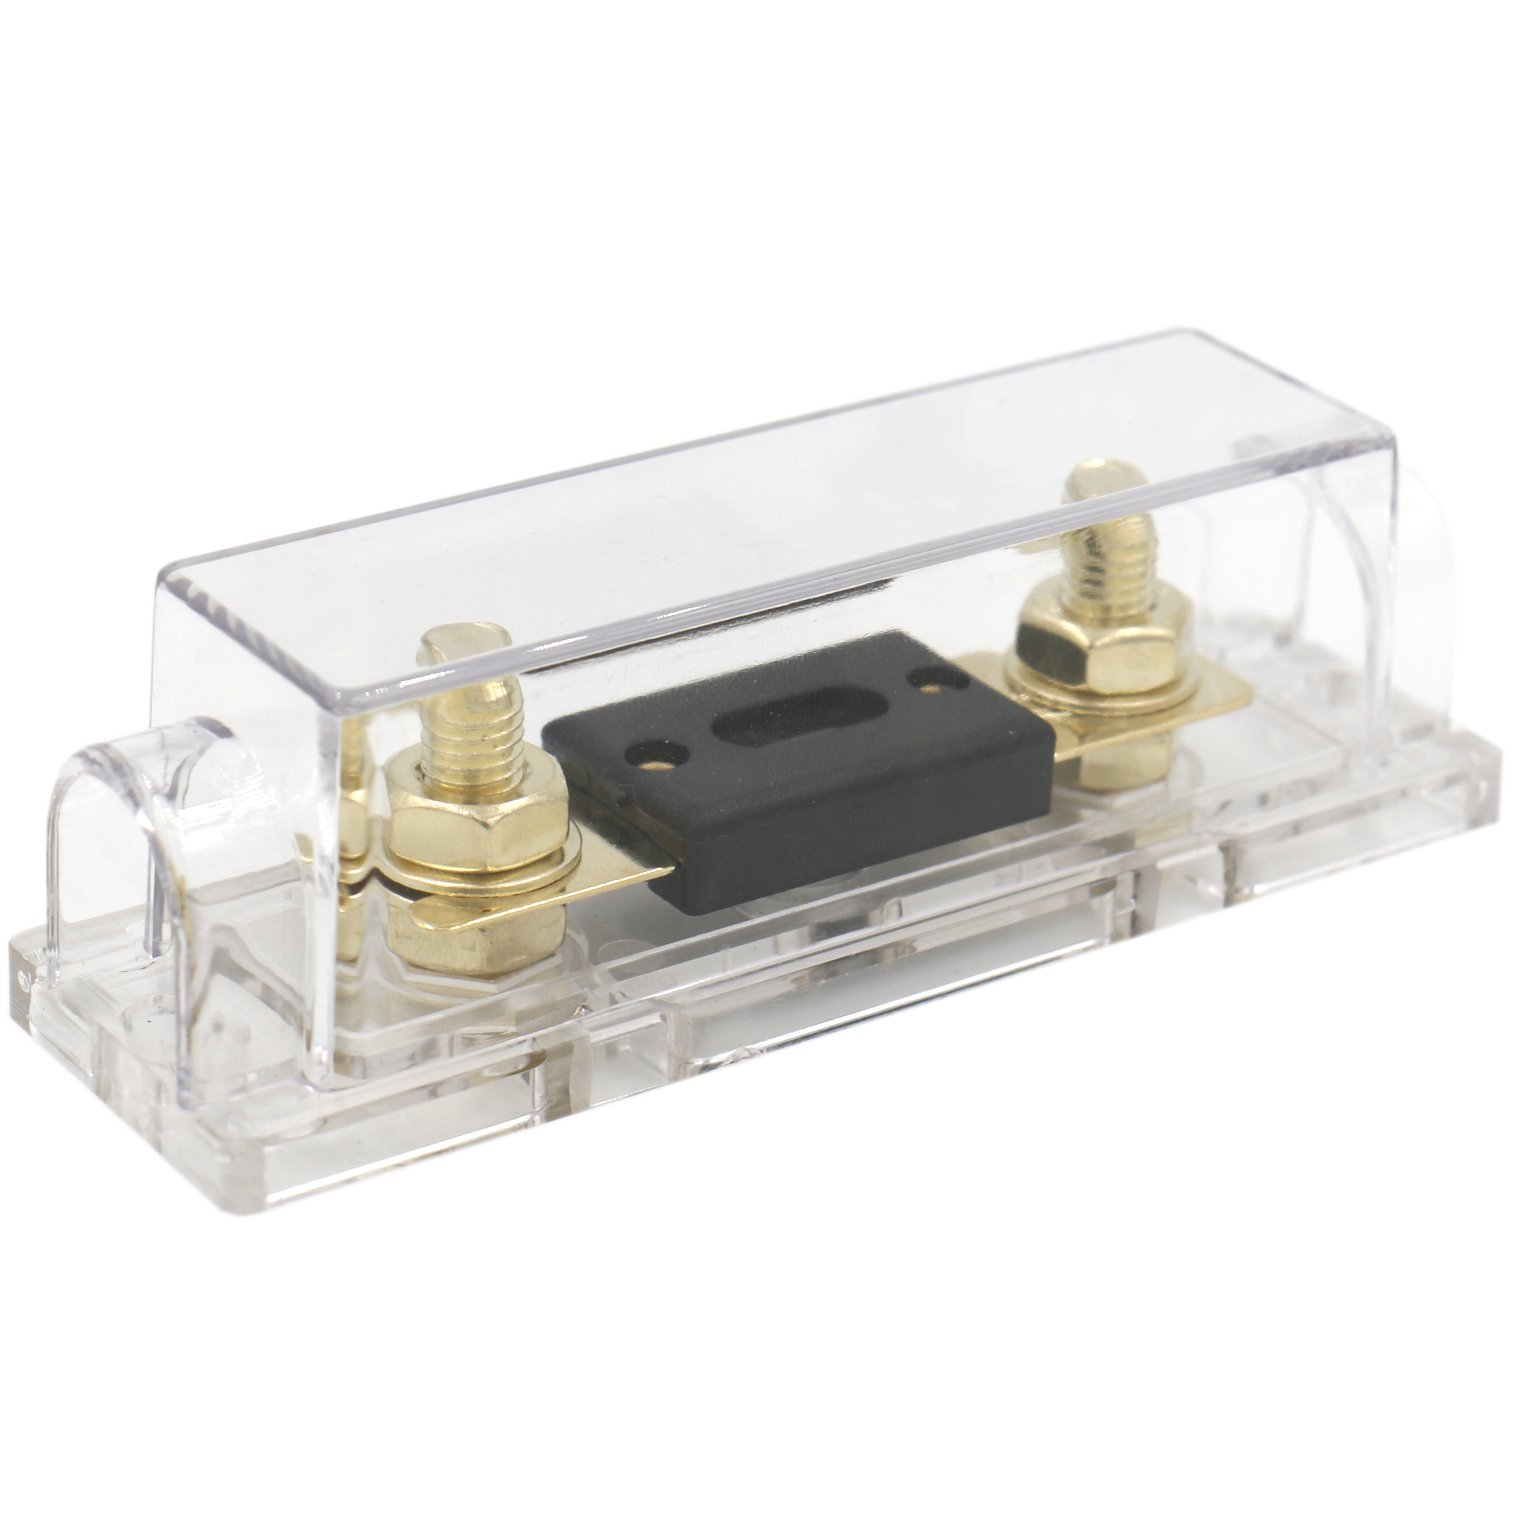 R Fusible ANL de proteccion del sistema de audio de auto coche 100Amp Tono de plata negro SODIAL